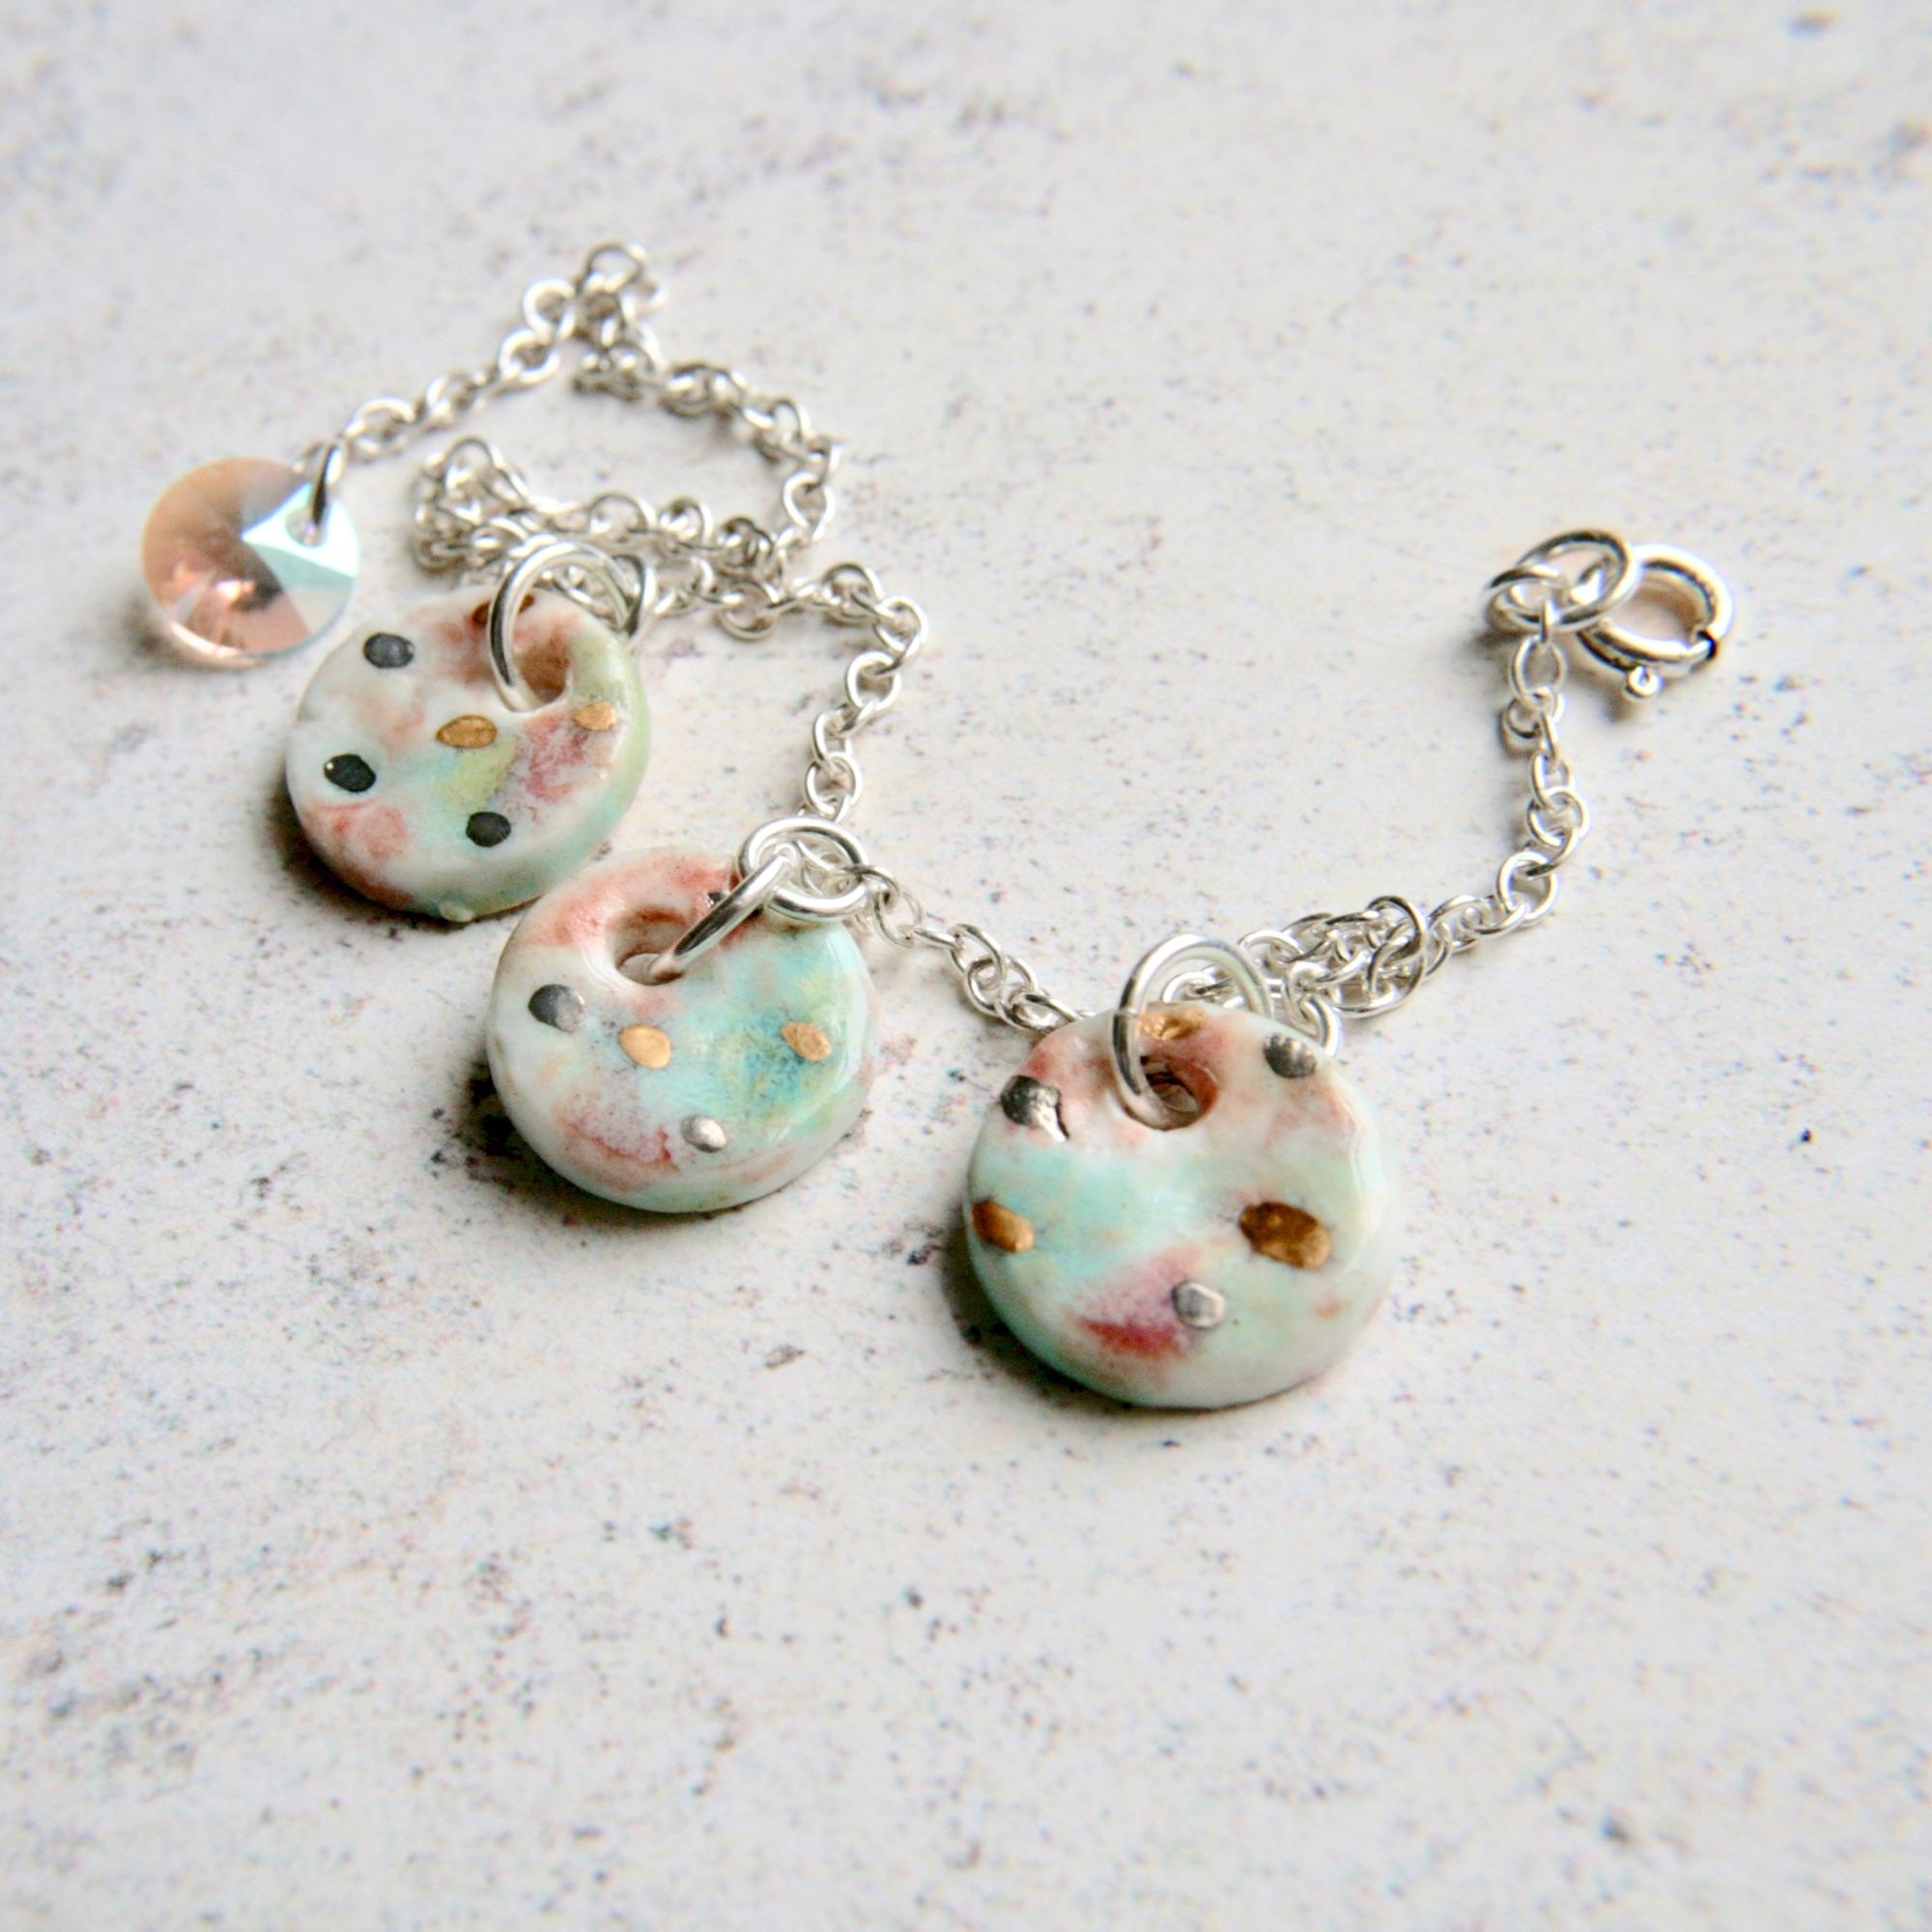 charm bracelet, summer bracelet, porcelain charms, decorella handmade jewellery (7).jpg